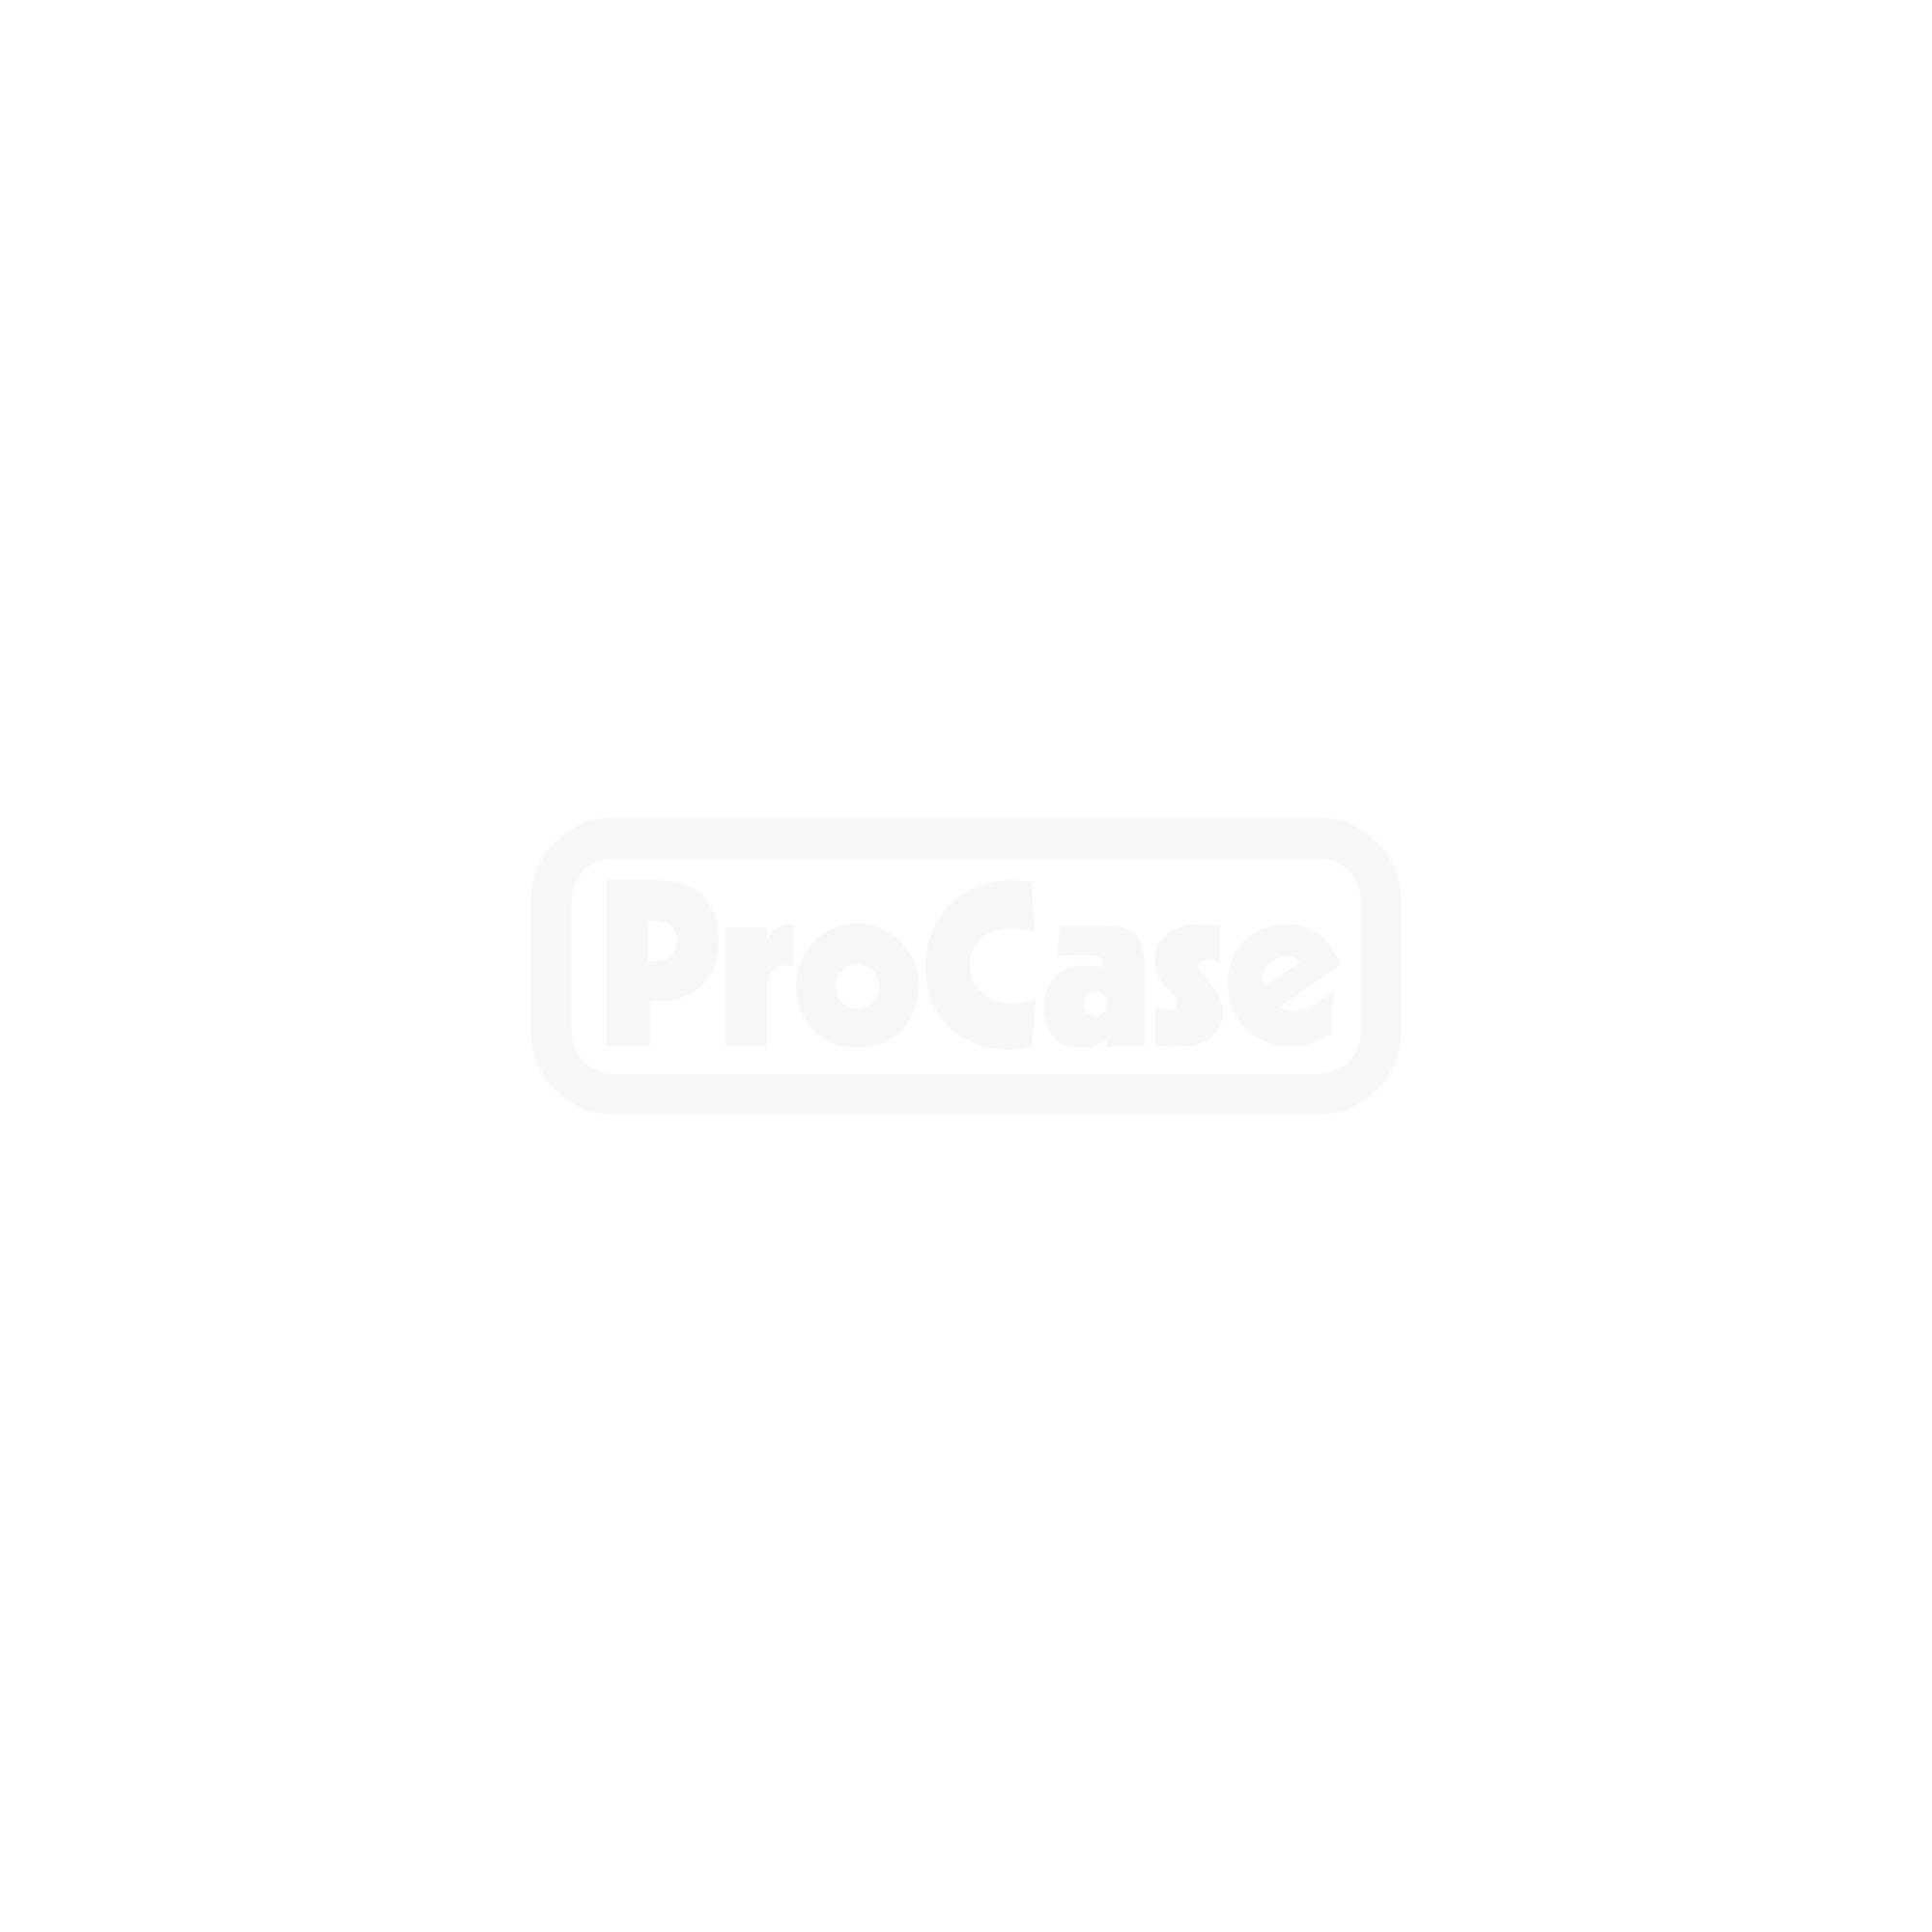 Flightcase für 2x JBL VerTec VT4883 2